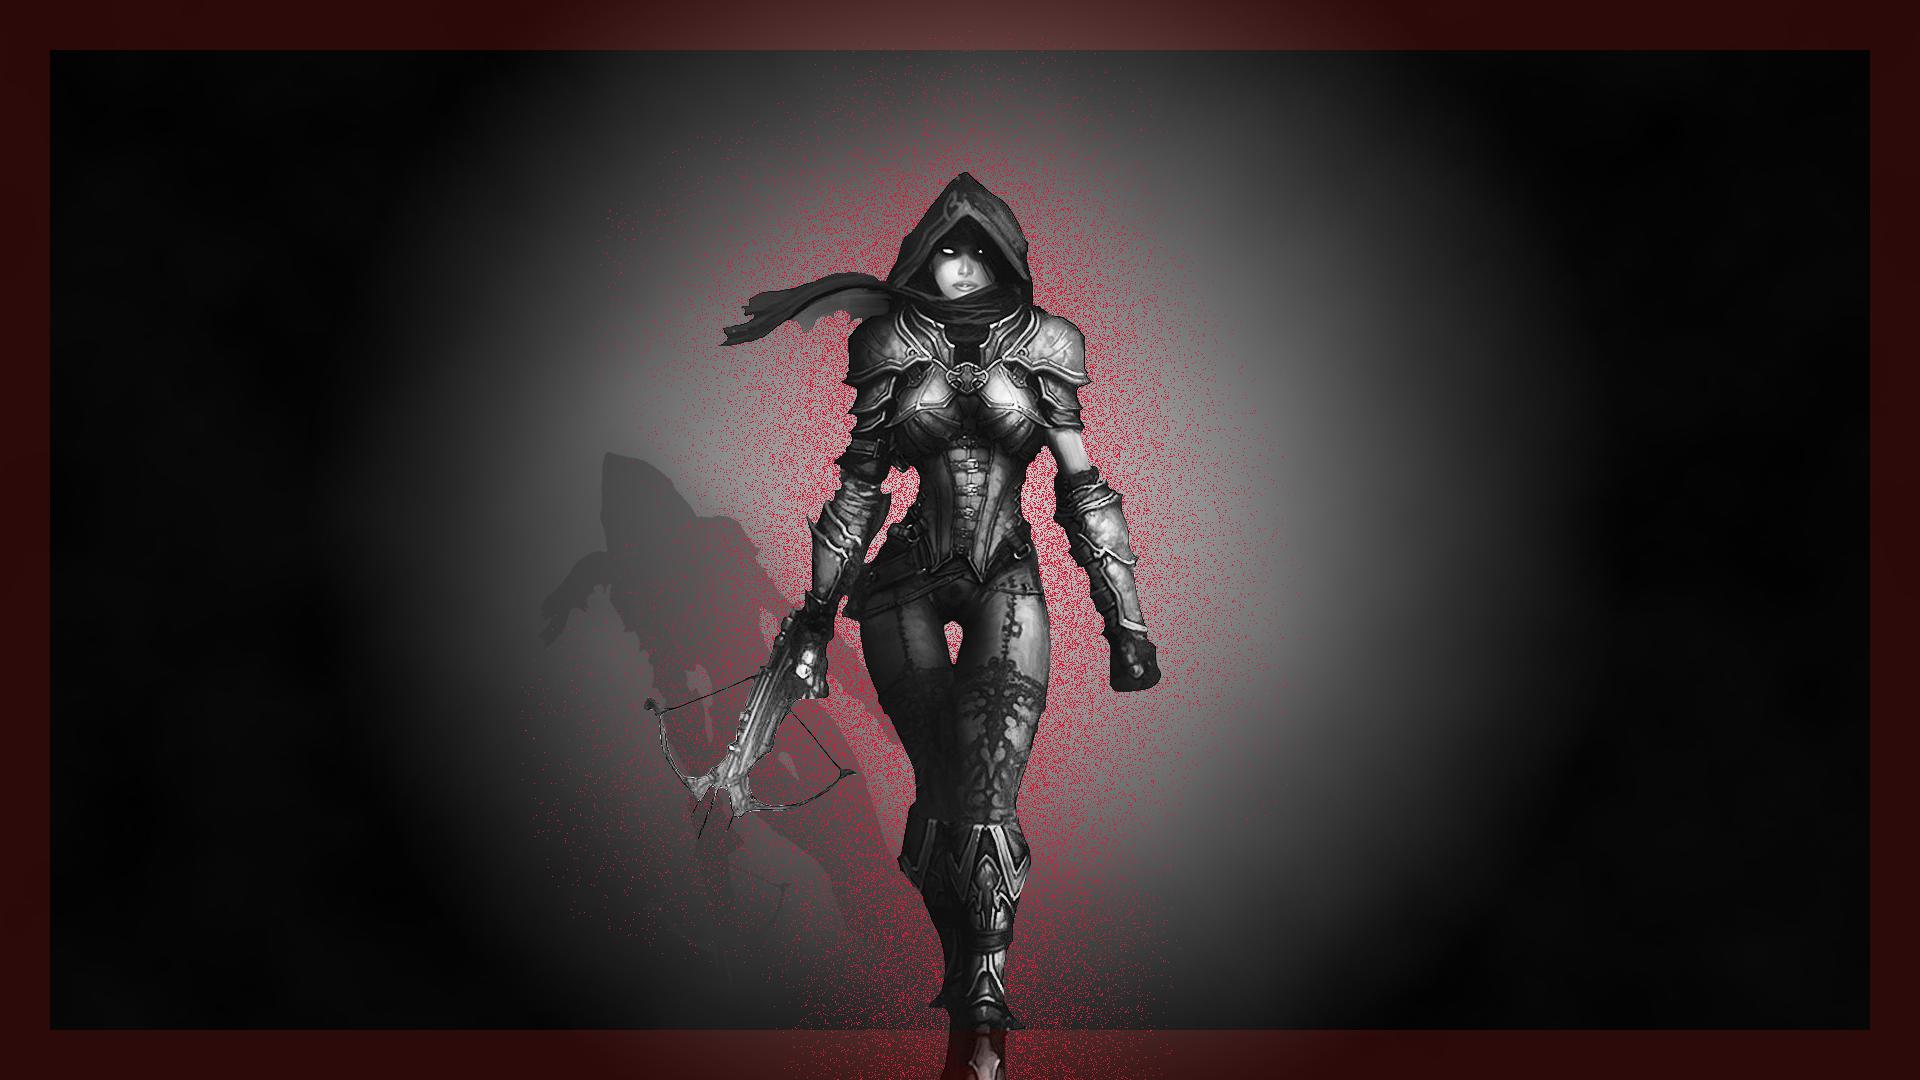 Diablo 3 Demon Hunter By Dexyphered On Deviantart